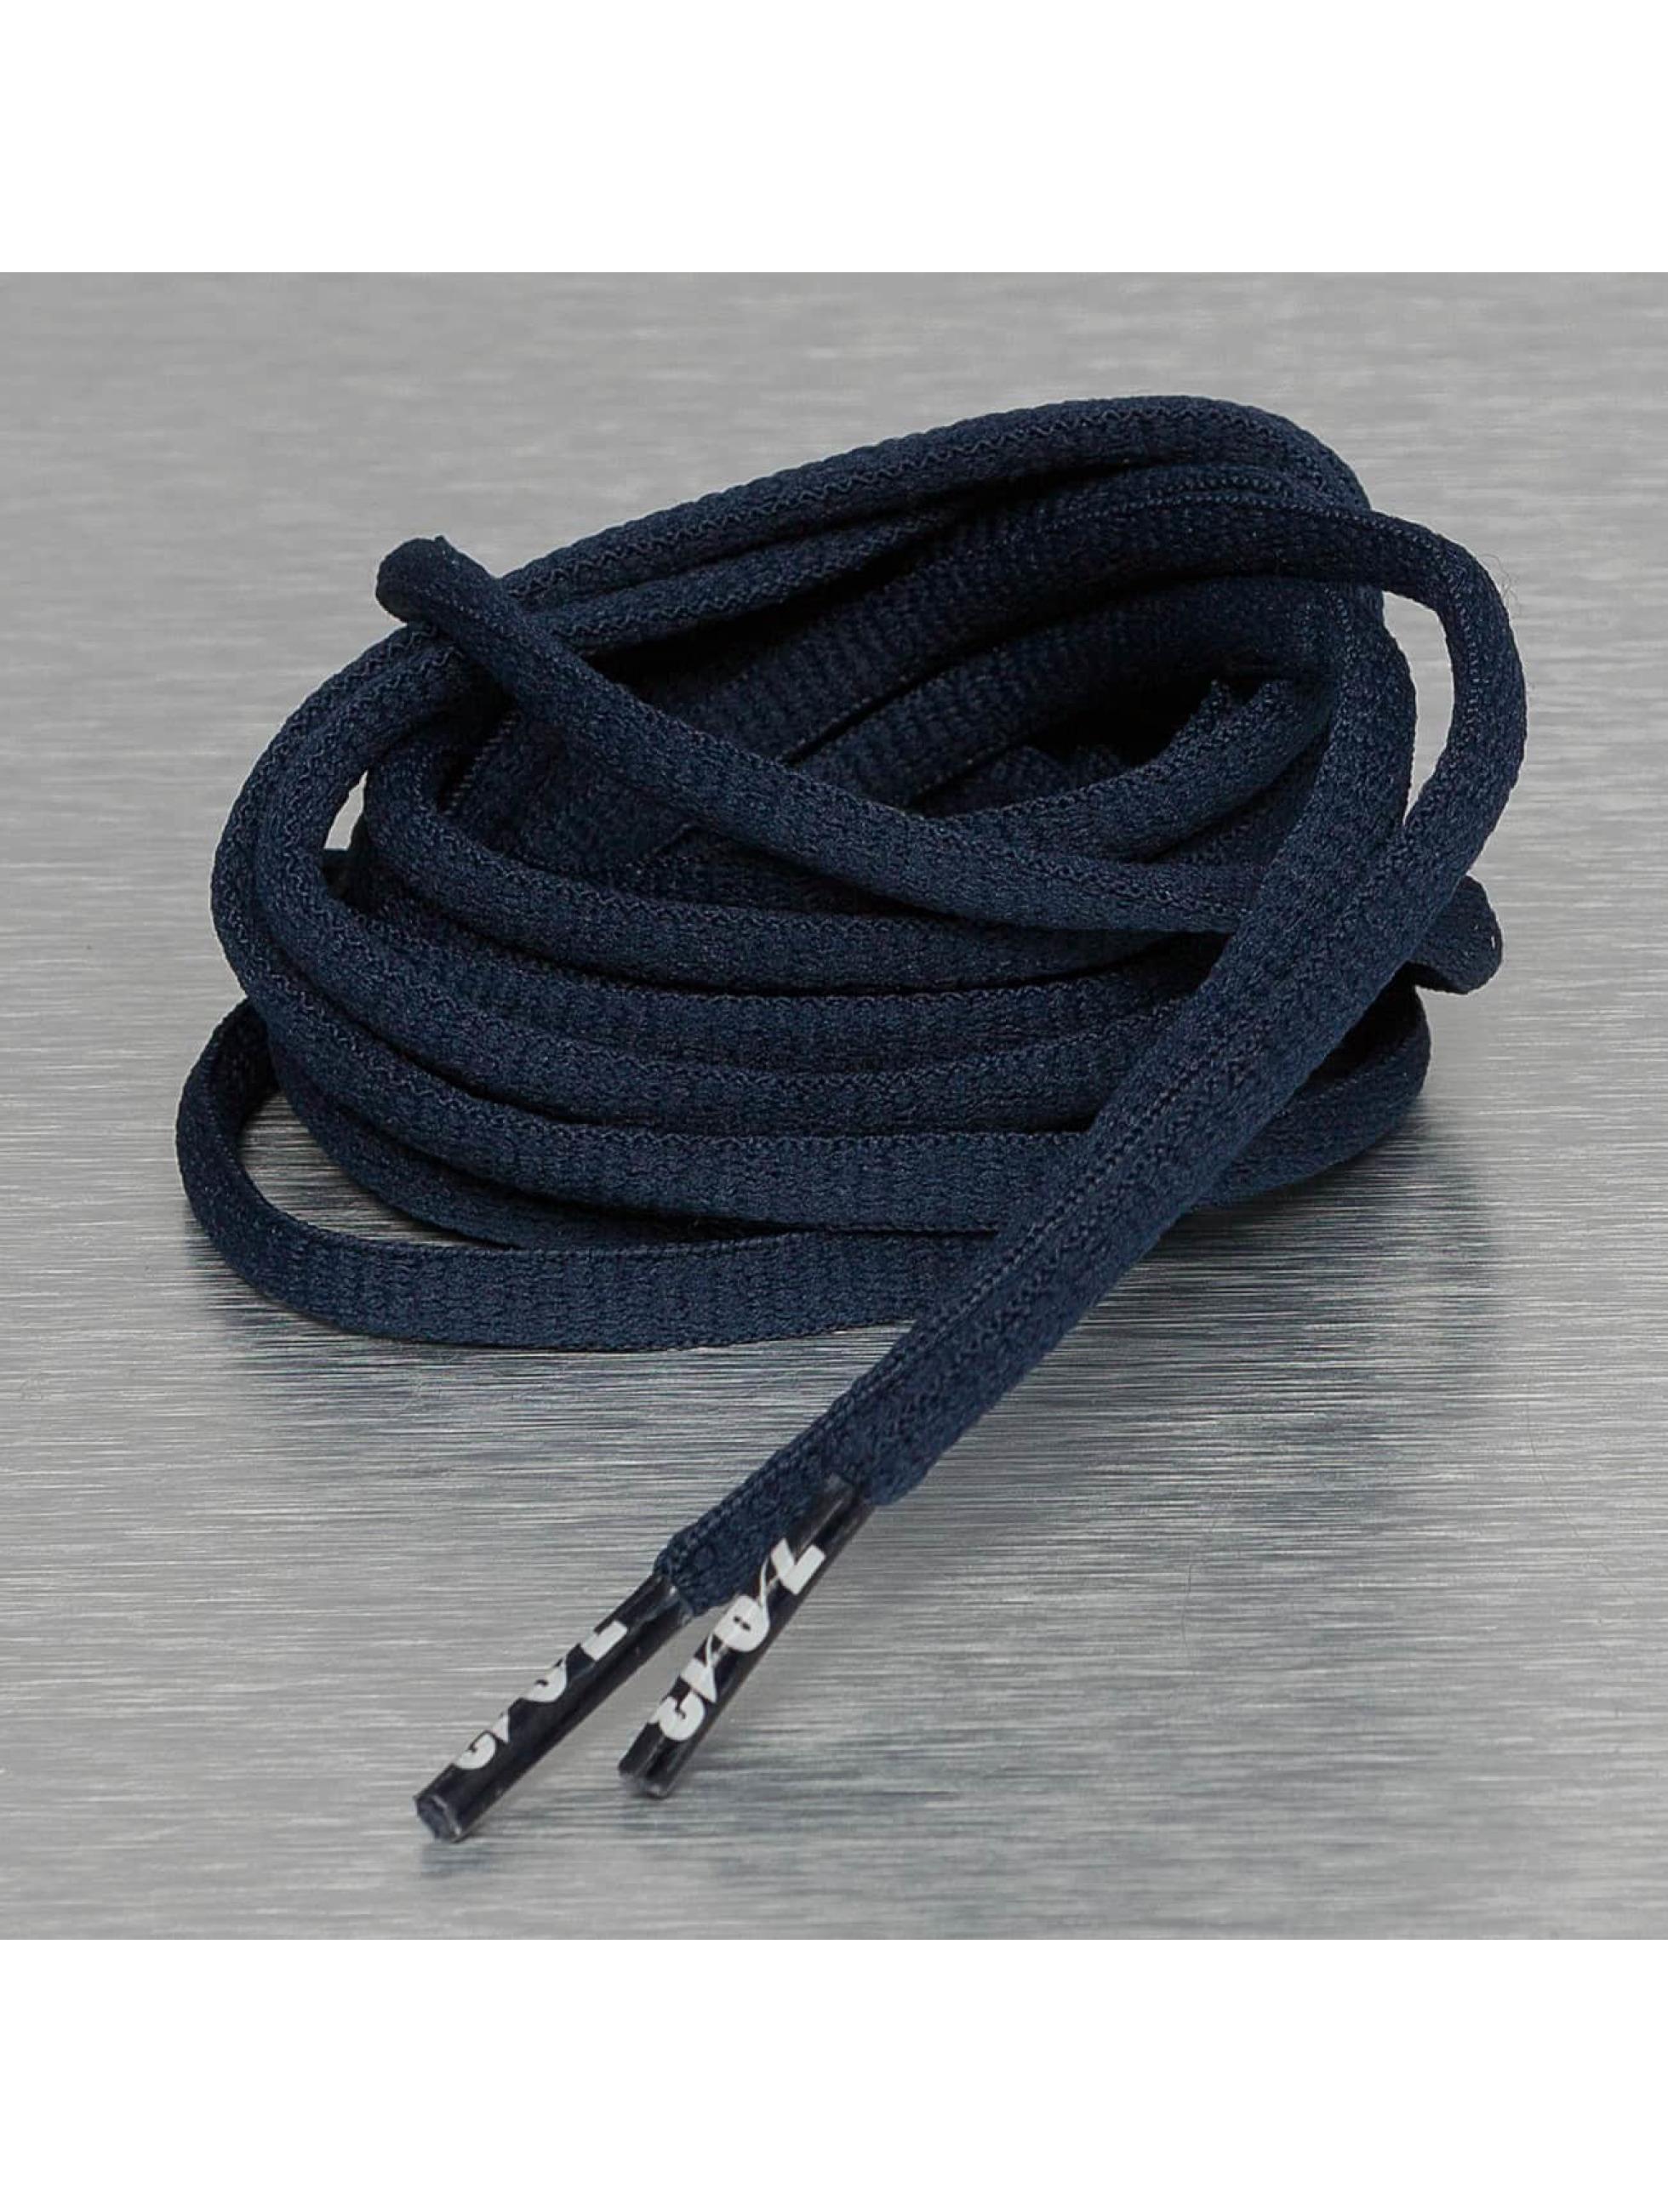 Seven Nine 13 Shoelace Hard Candy Round blue